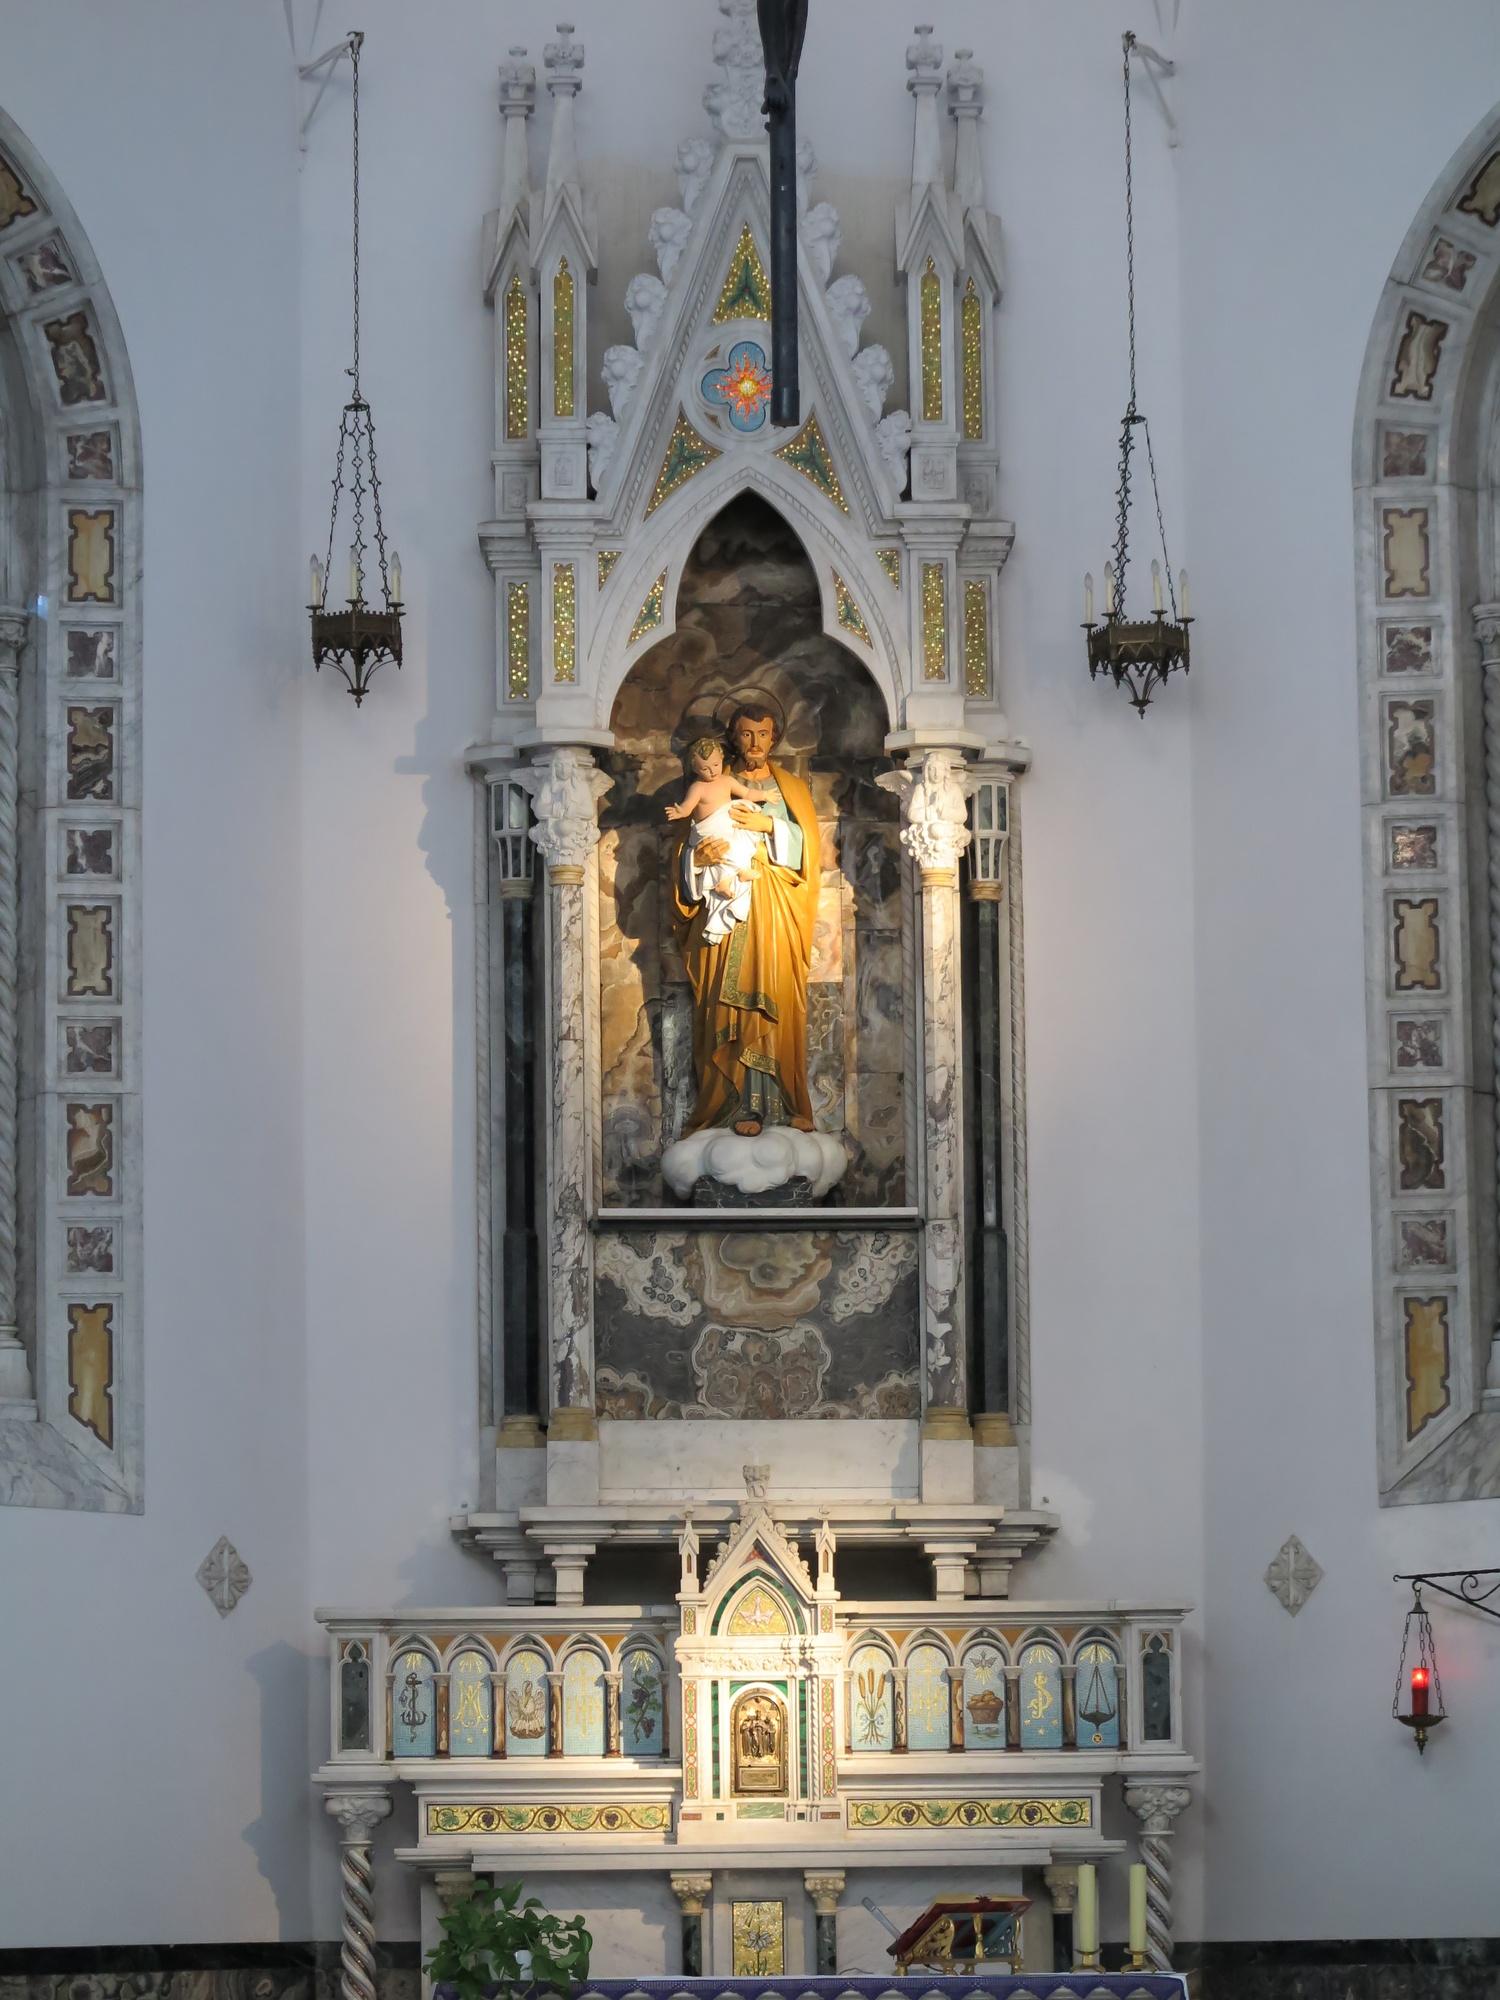 chiesa-2016-03-07-15-04-14